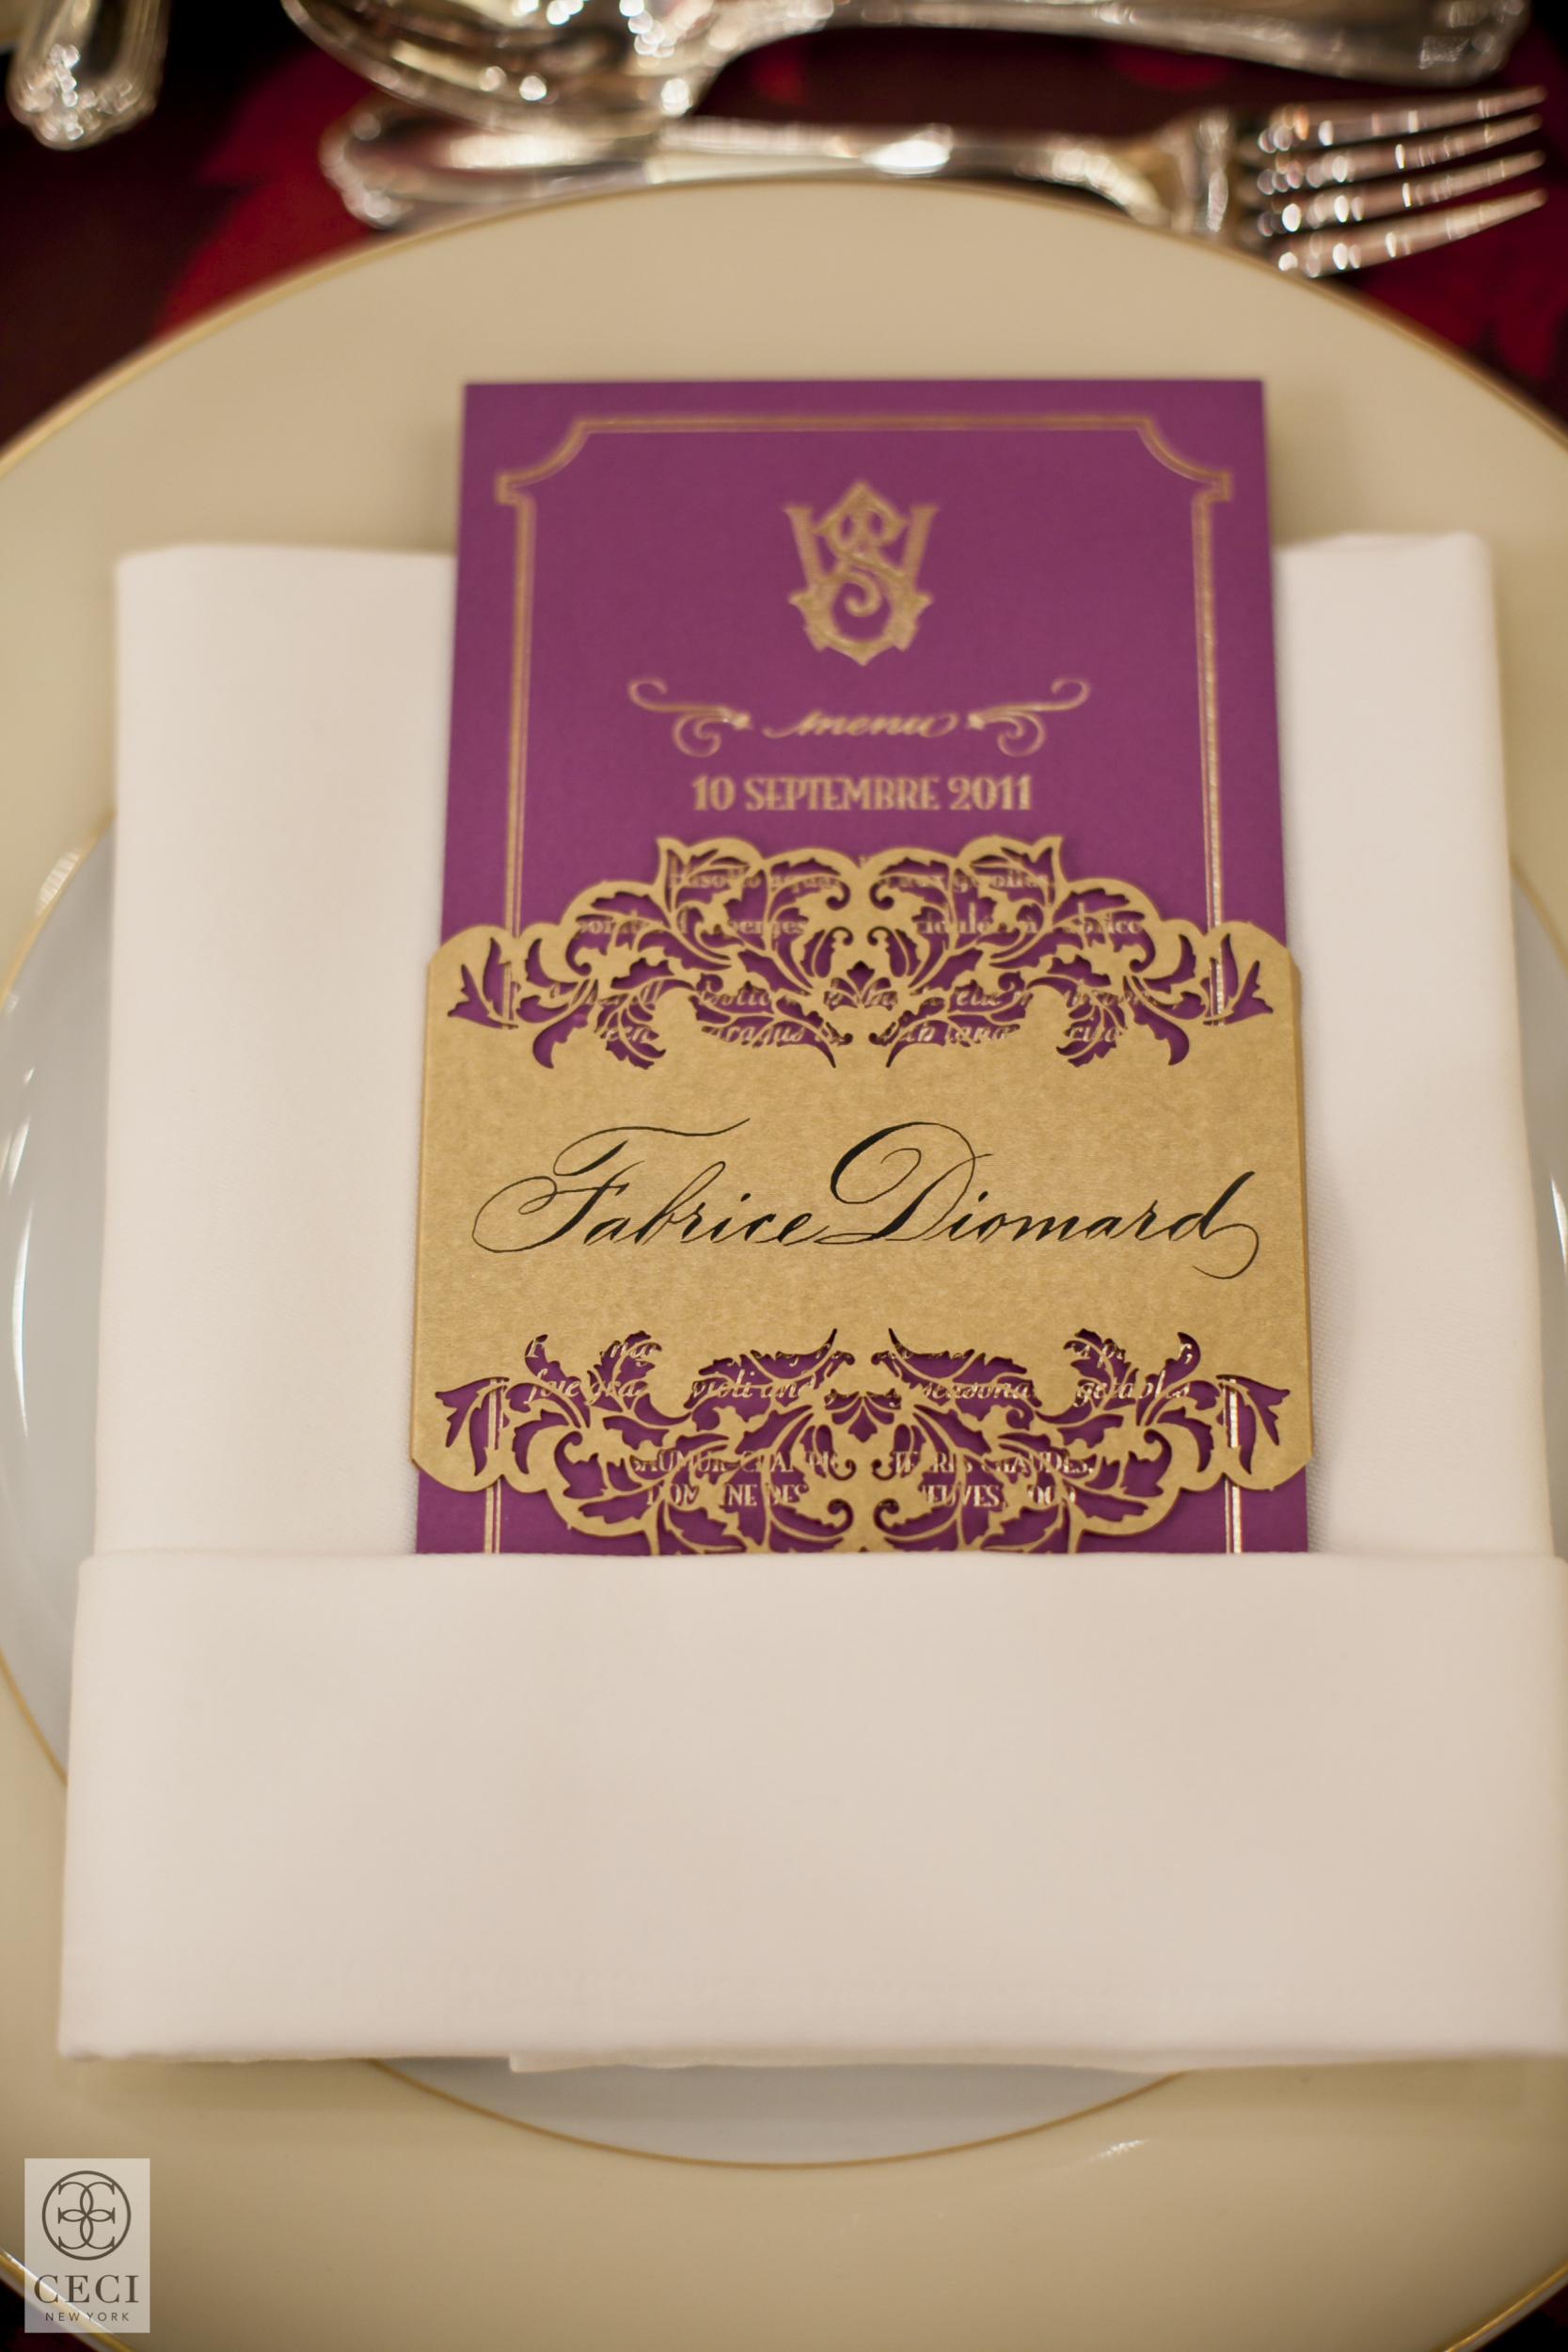 ceci_new_york_lucas_somoza_purple_regal_wediding_birthday_commitment_ceremony_invitation_logo_branding_perfume_gold_-5.jpg